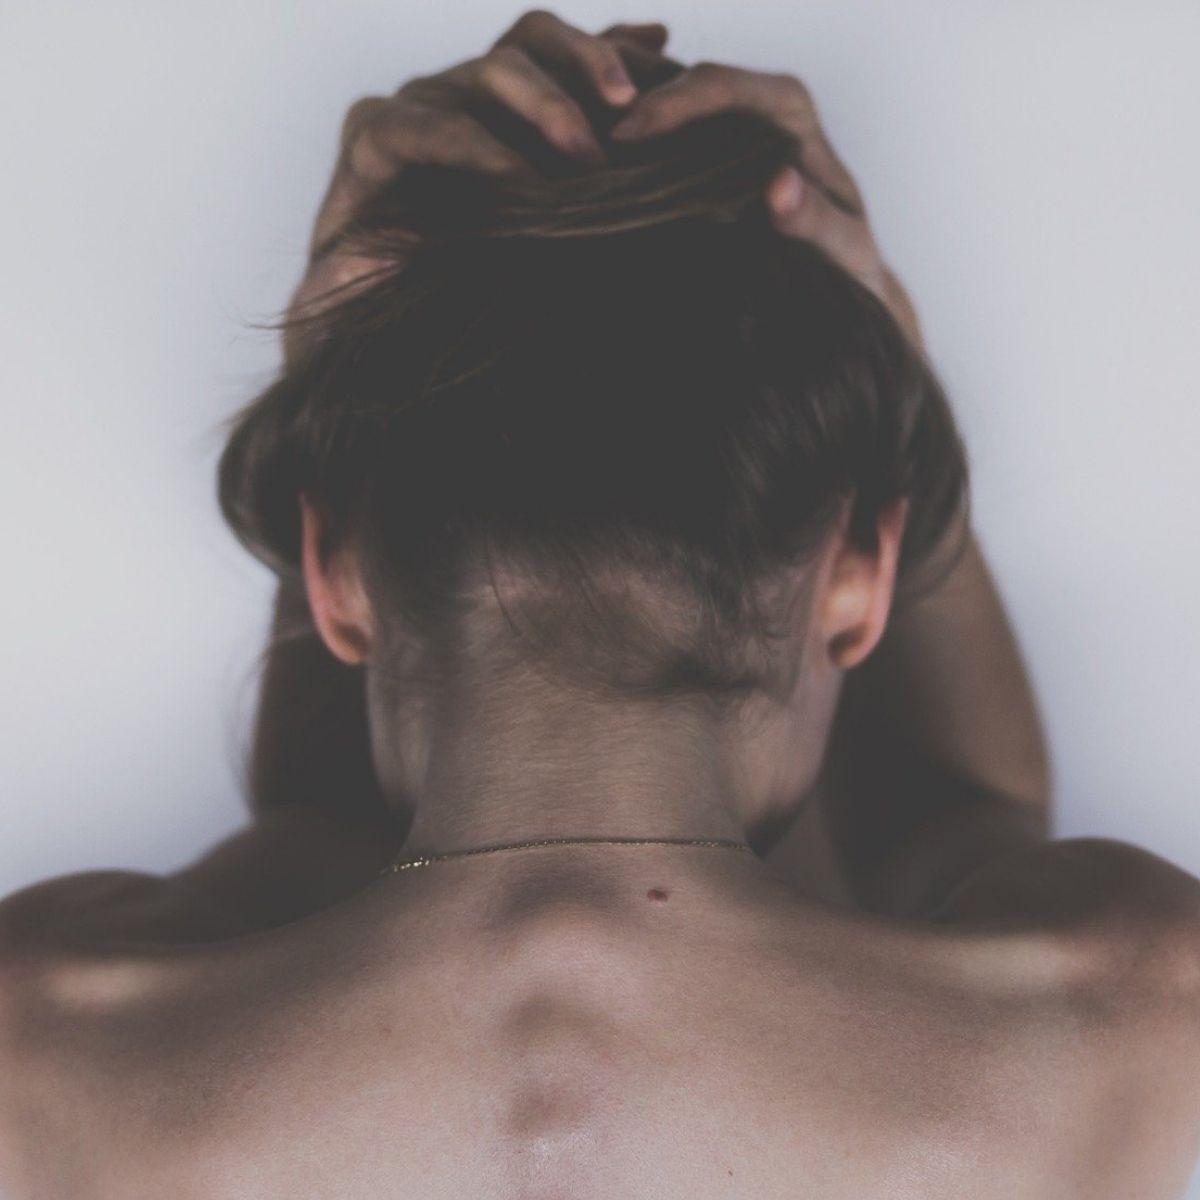 Symbolbild - Depressive Frau